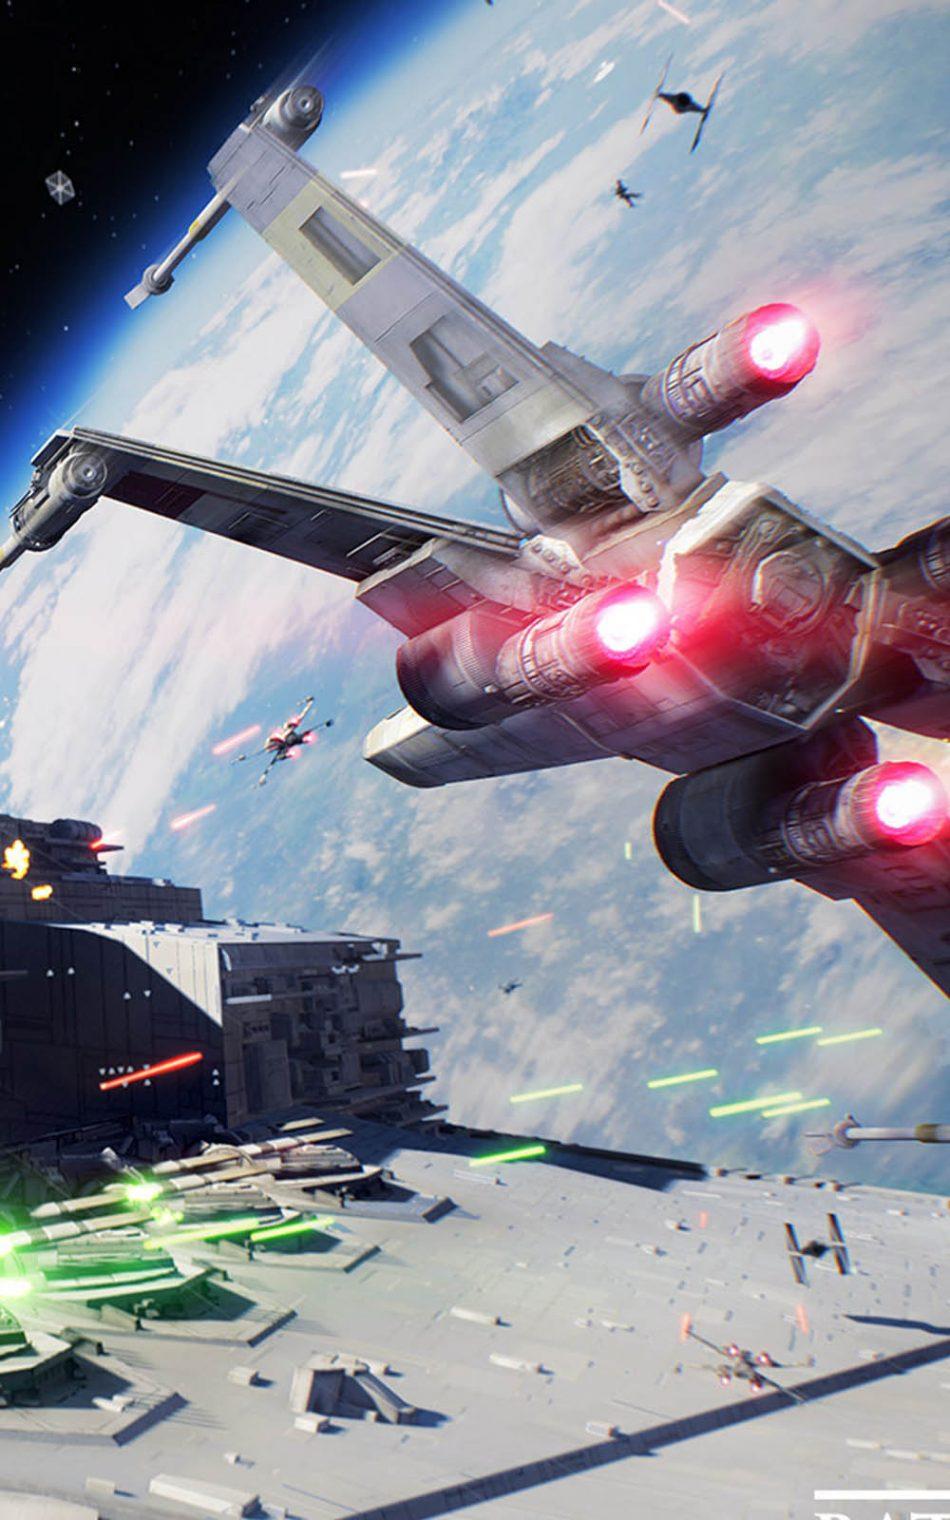 Spaceship Star Wars Star Wars Battlefront 2 Phone 950x1520 Wallpaper Teahub Io